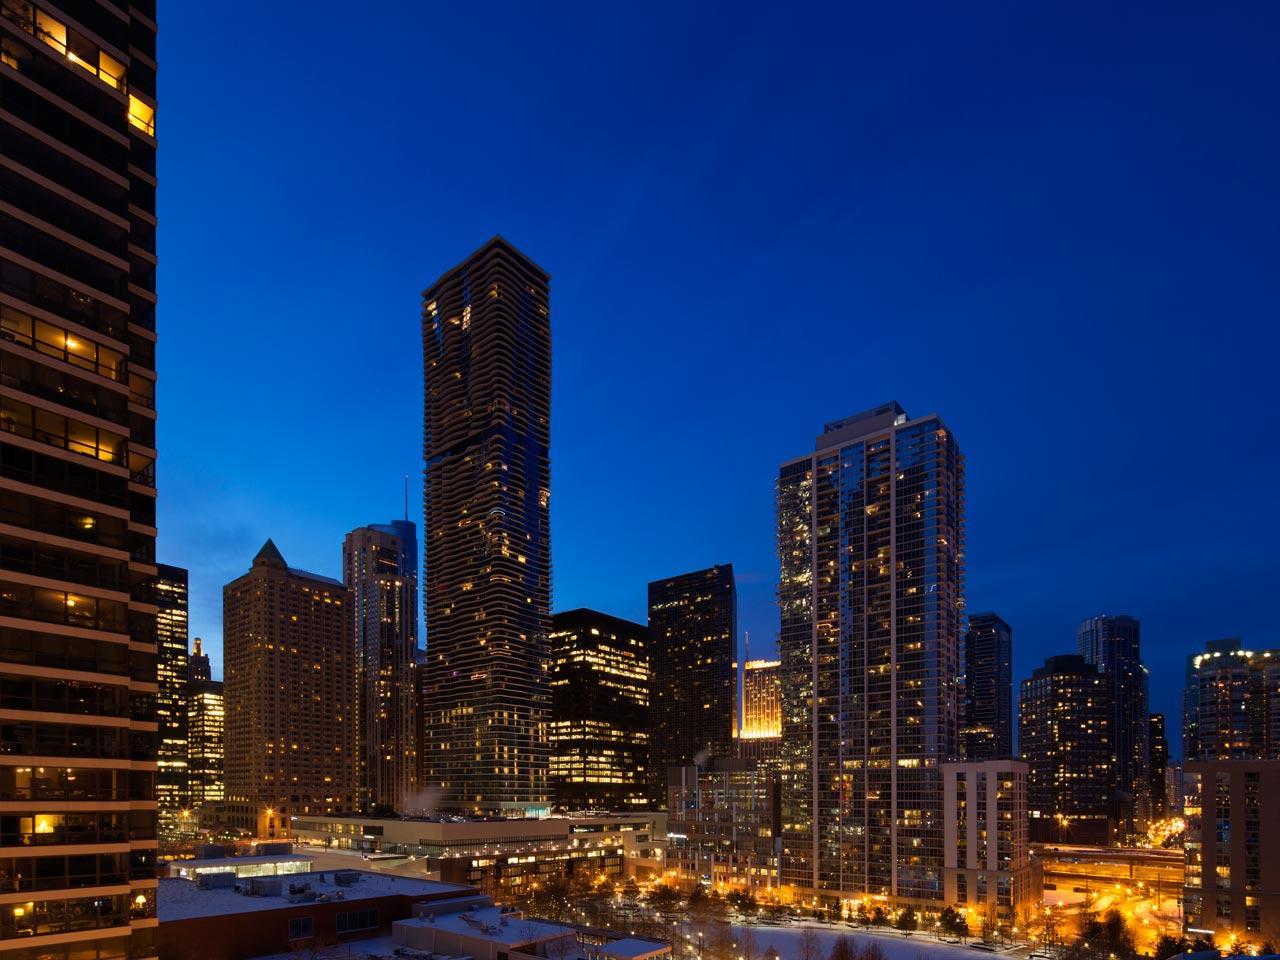 Radisson Blu Aqua Hotel, Chicago is Stunning in the Skyline